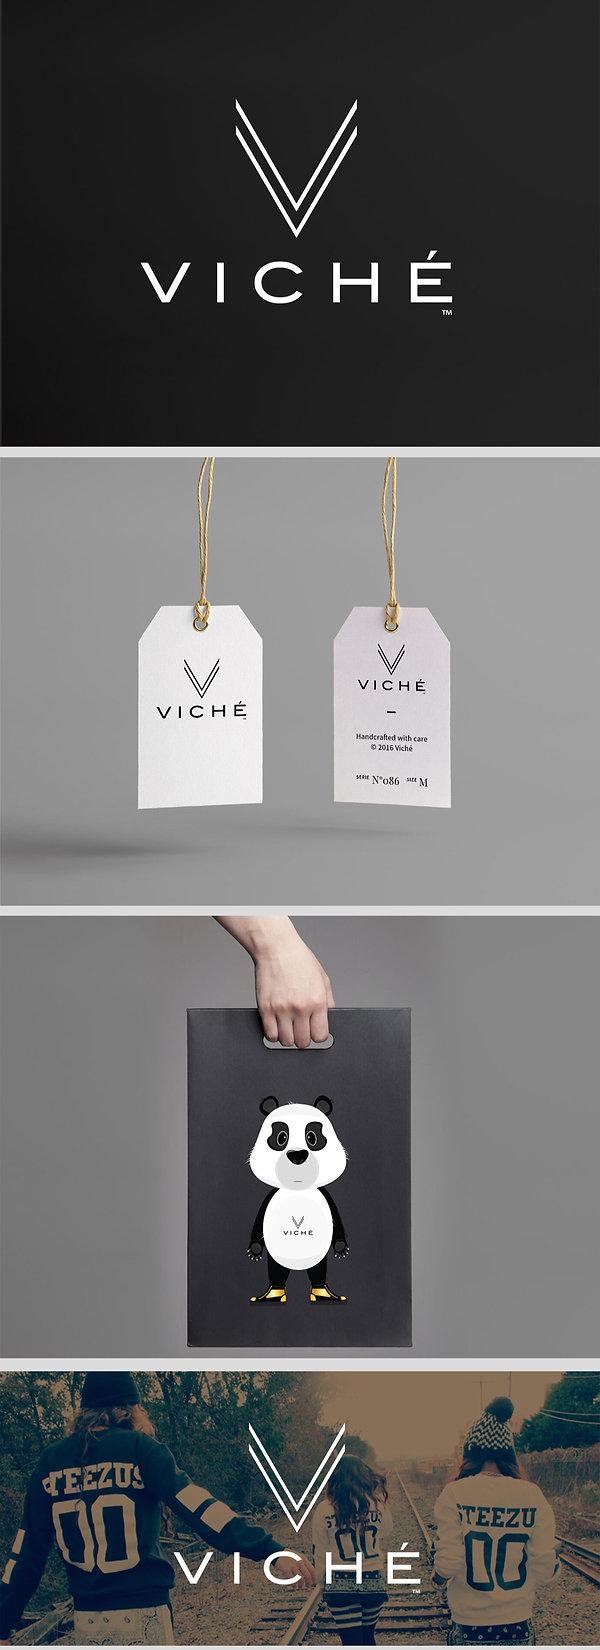 Viche Branding and Illustration.jpg